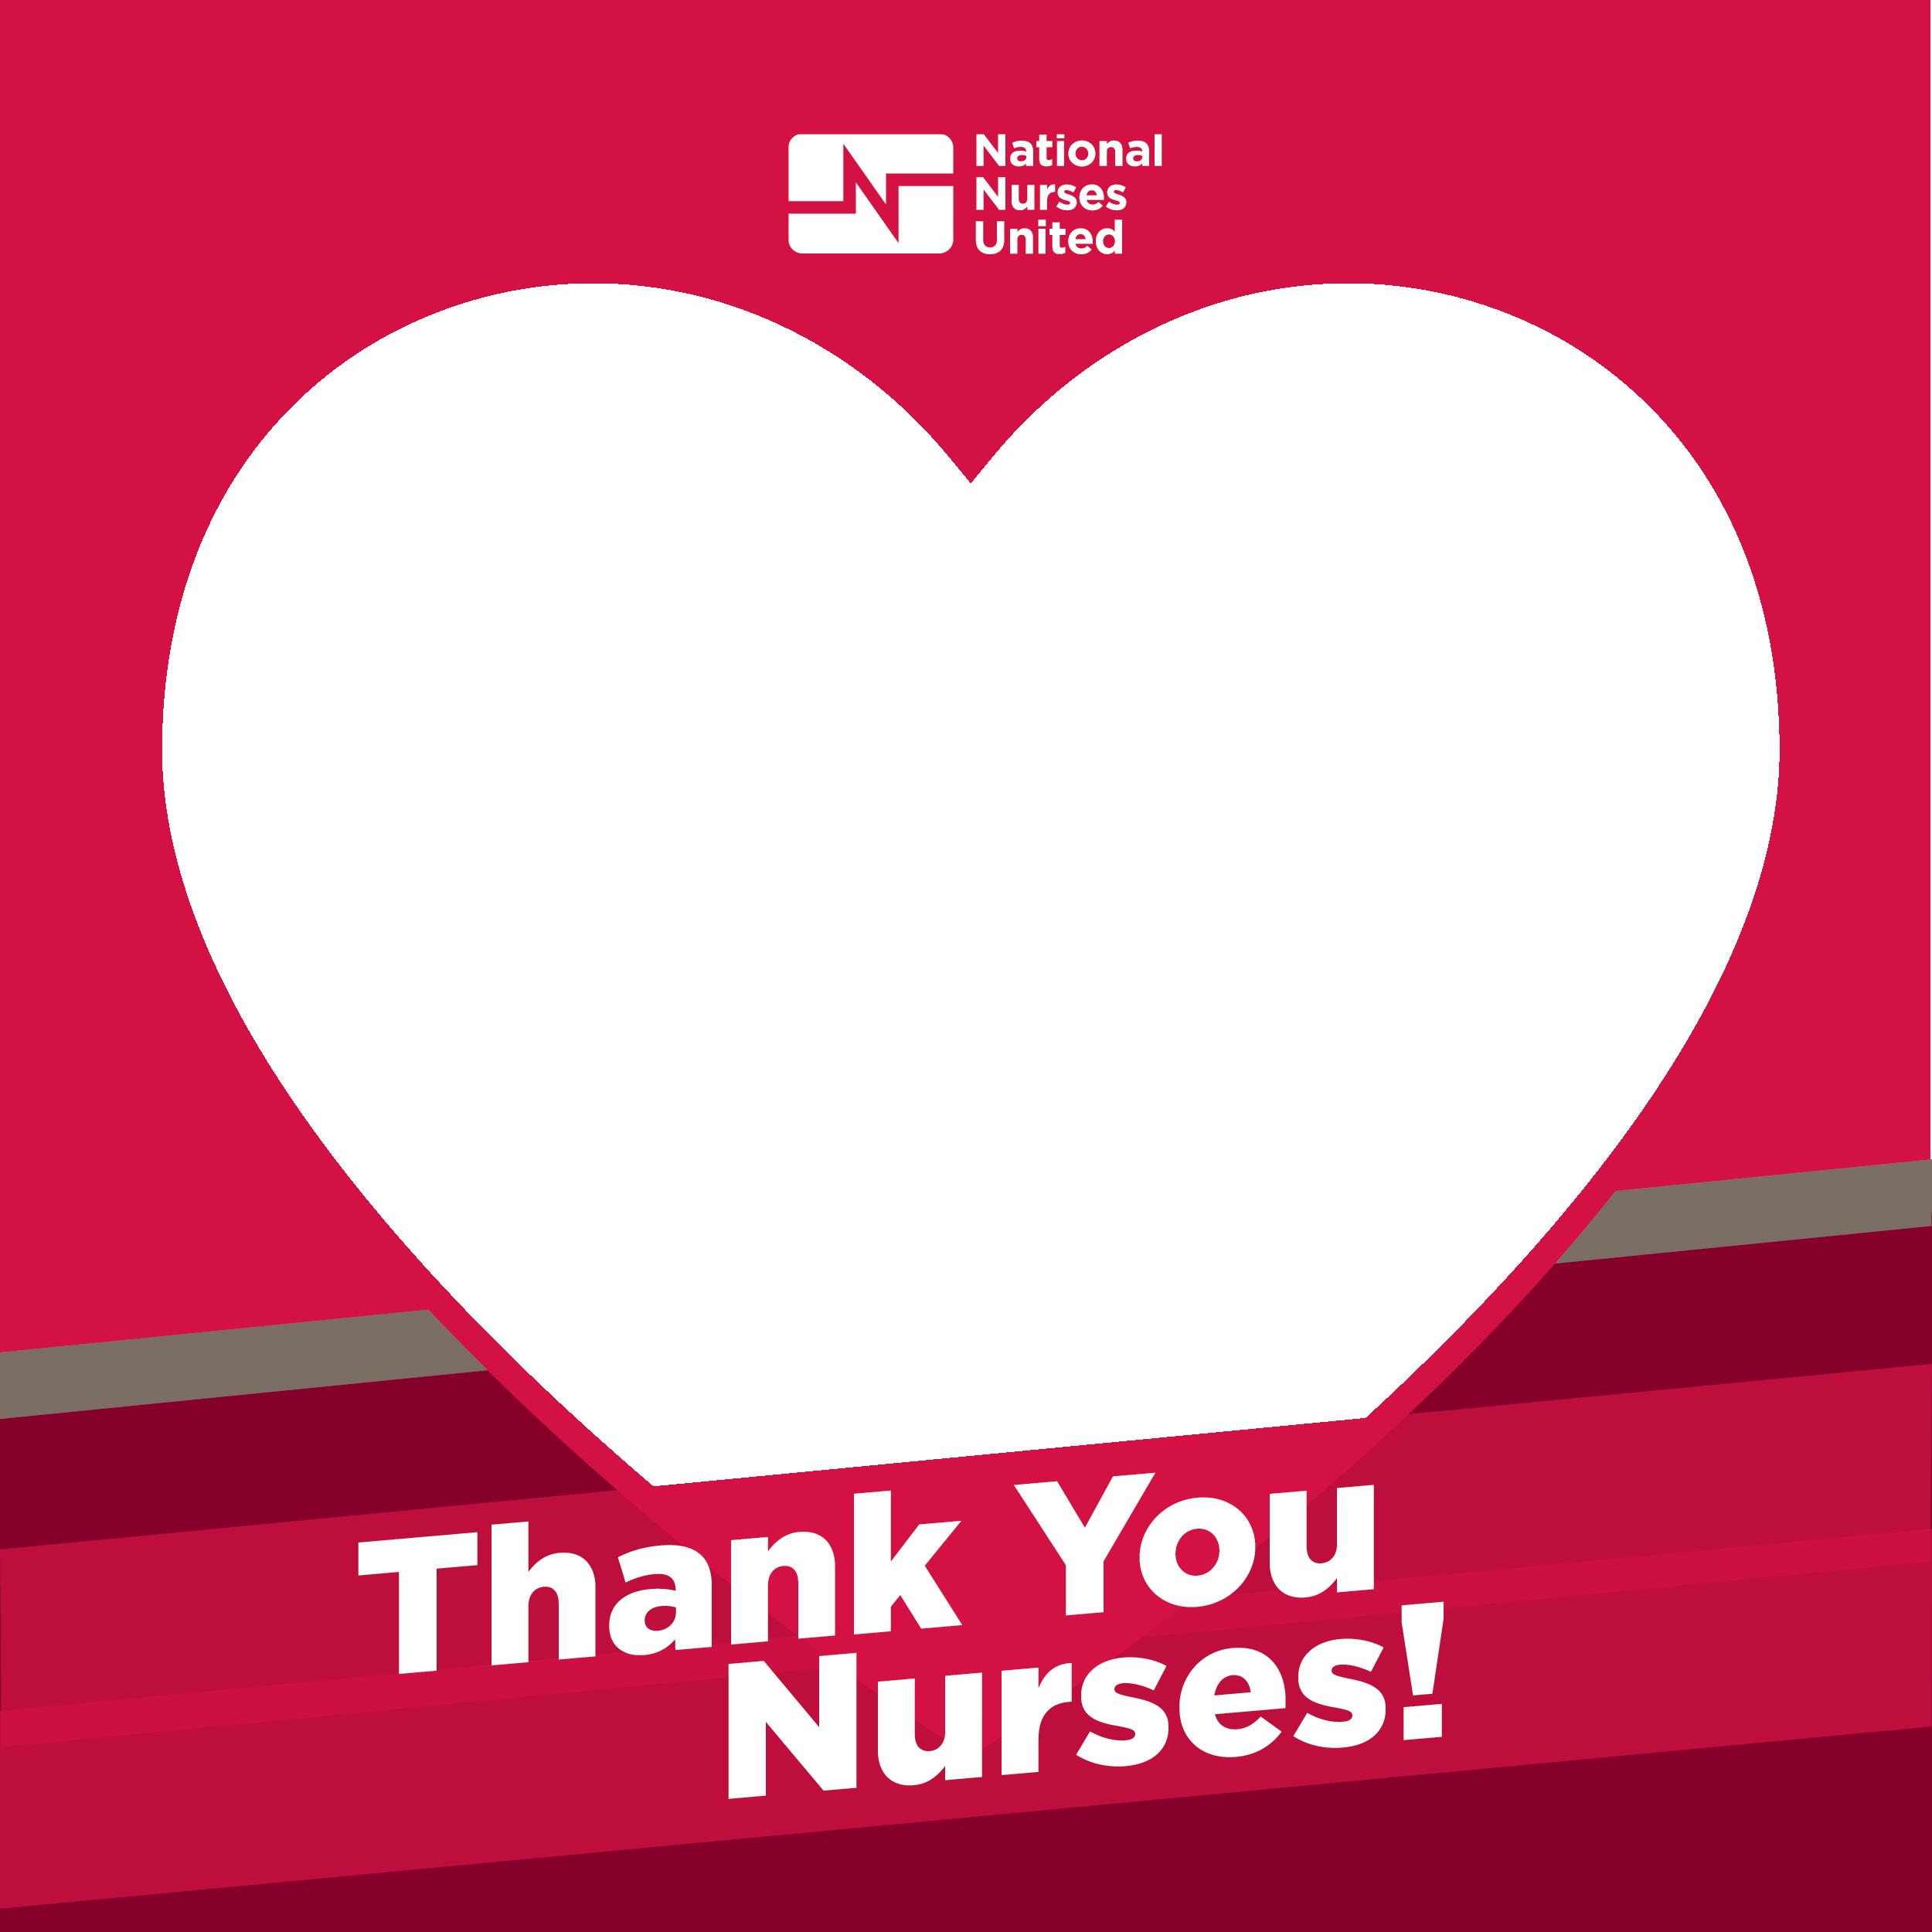 Thank You Nurses Heart Frame